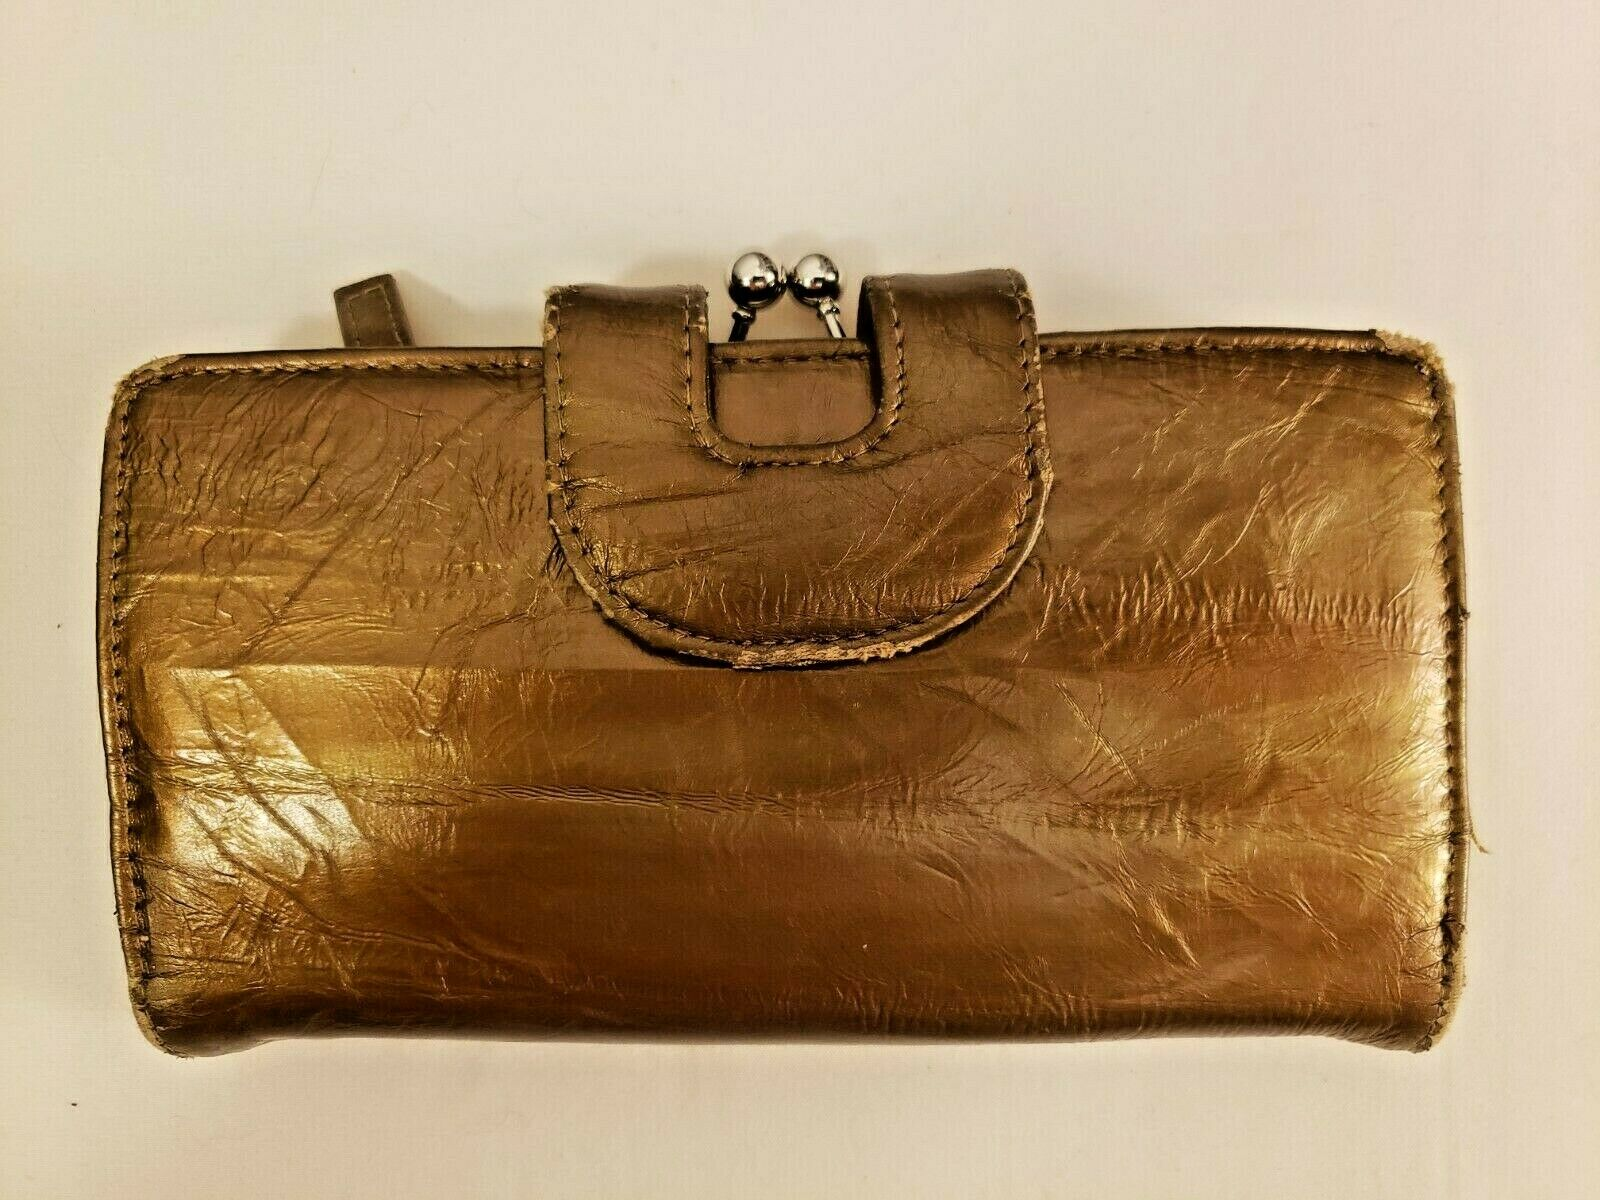 GENUINE EEL SKIN Gold Ladies Wallet - Pre-Owned One Owner Beautiful Condition!